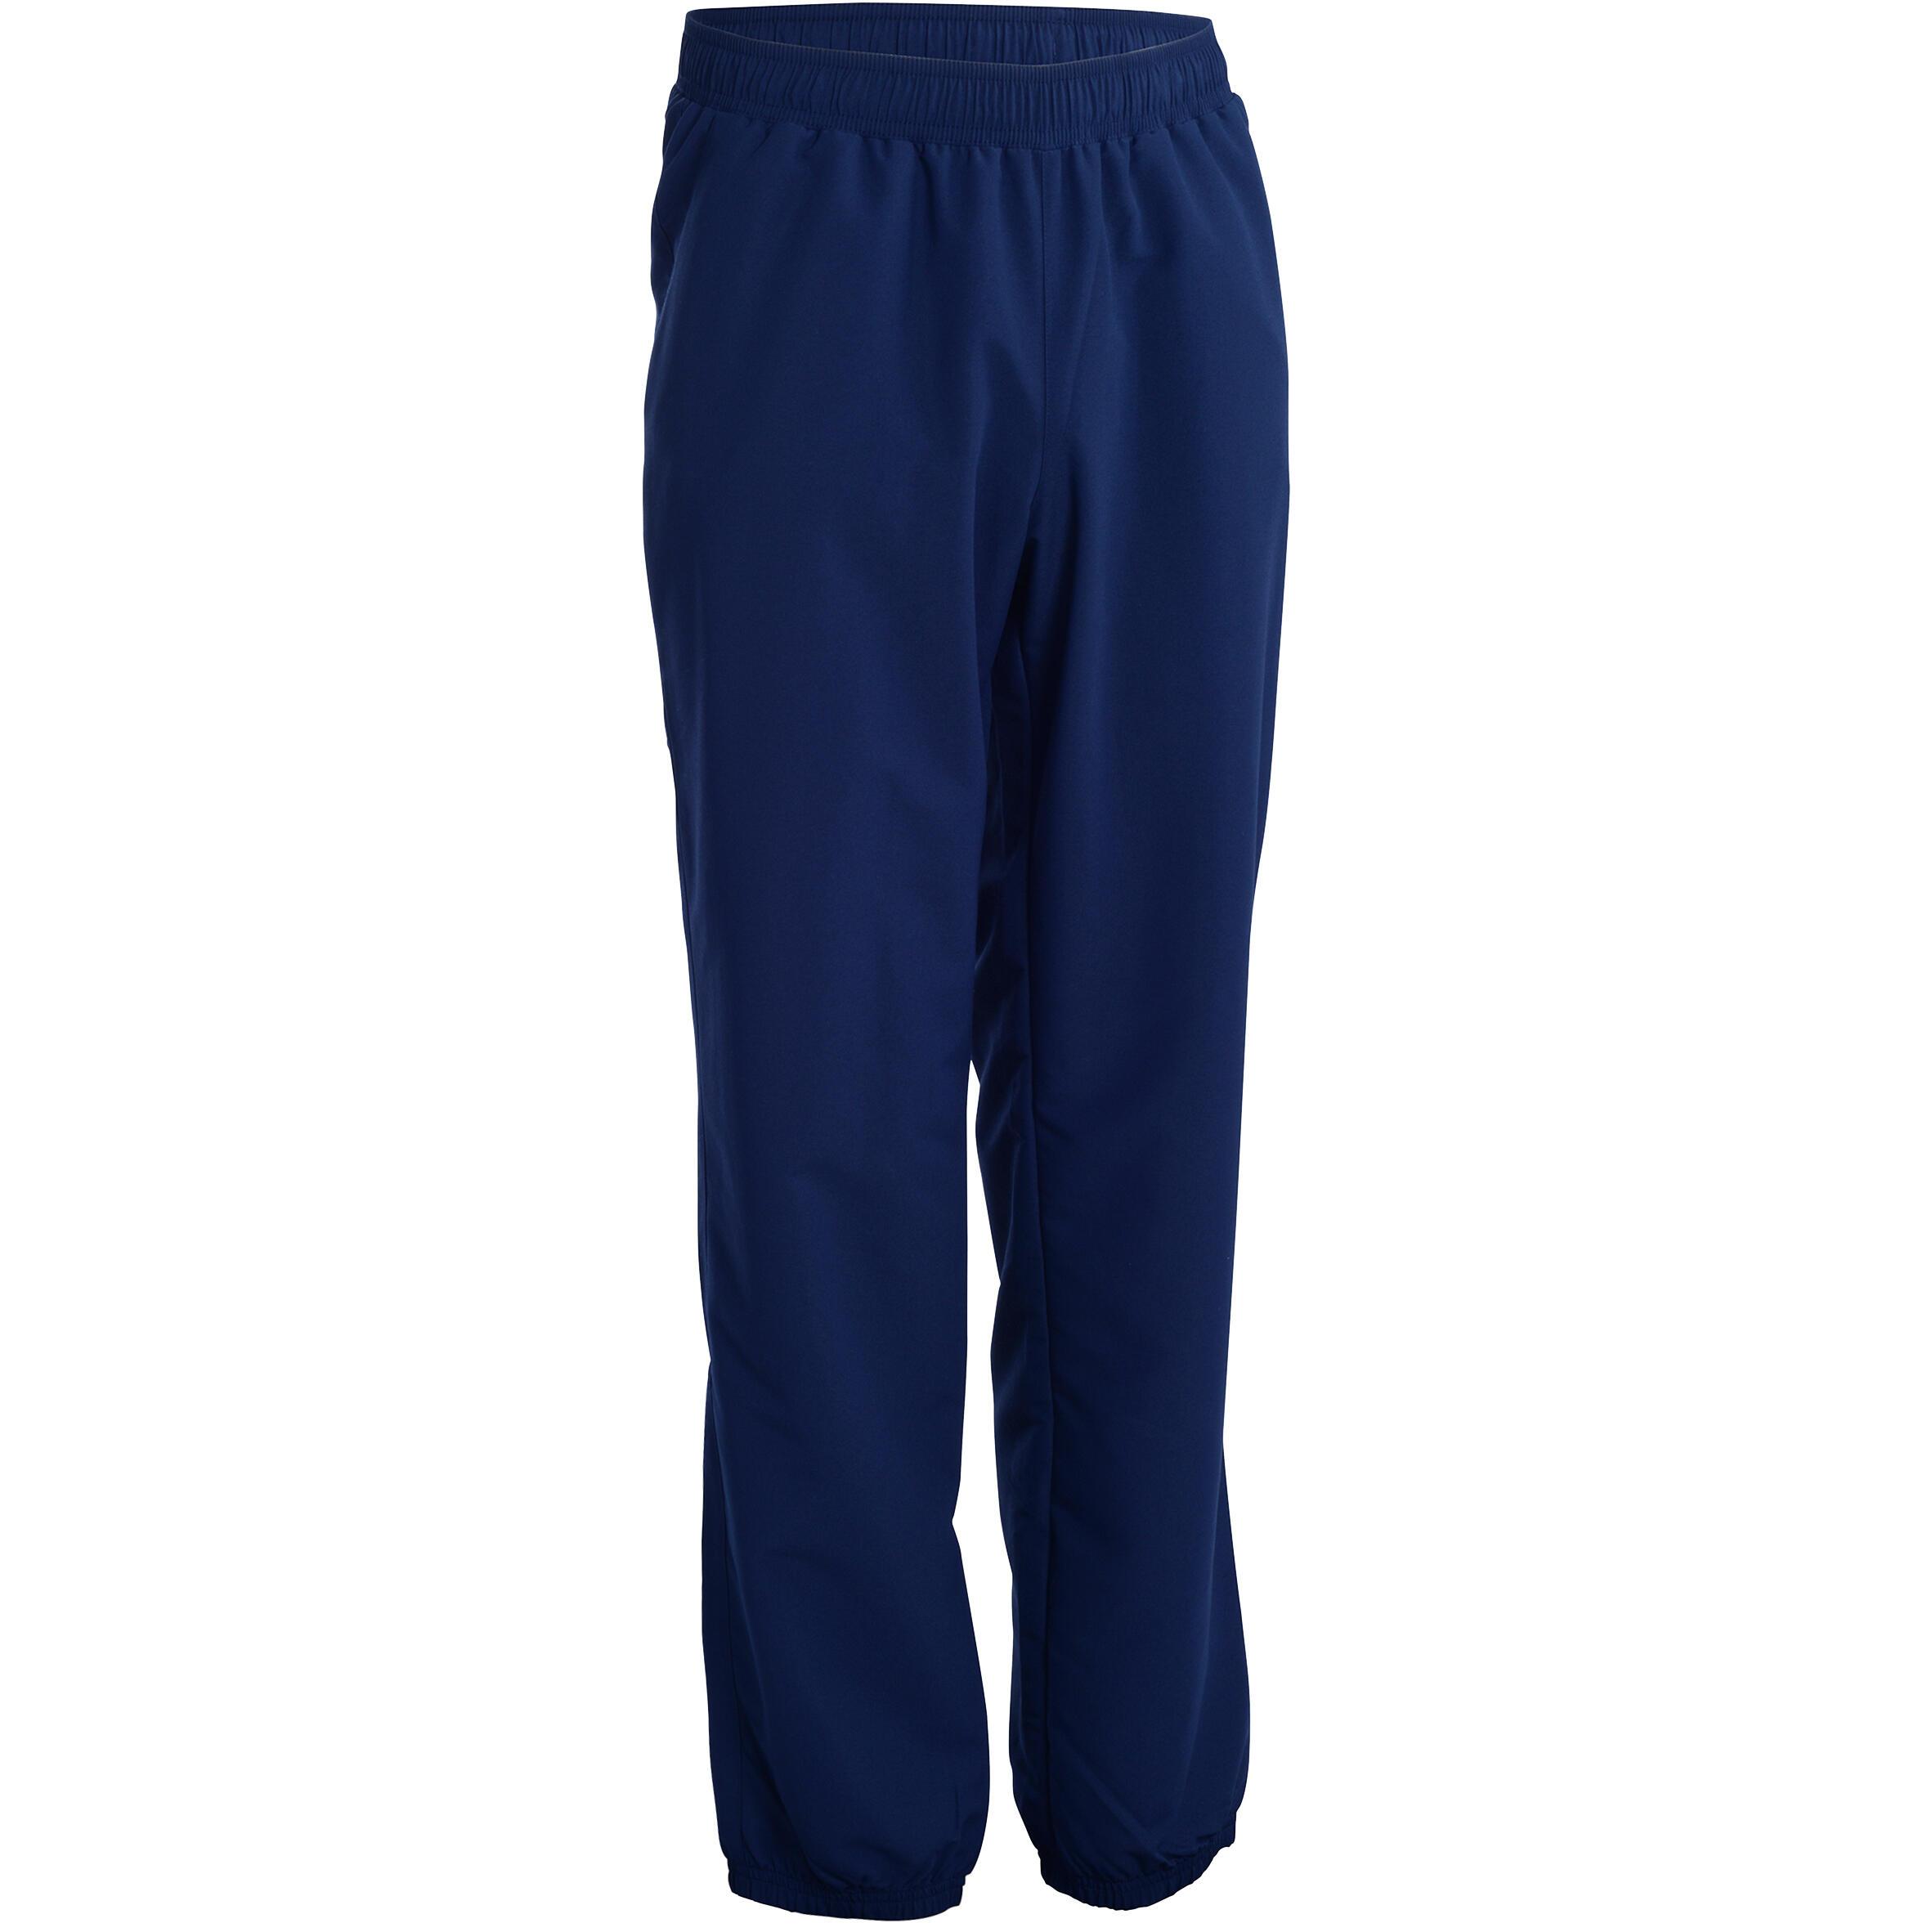 Pants de fitness cardio para hombre azul marino modelo fitness cardio FPA100